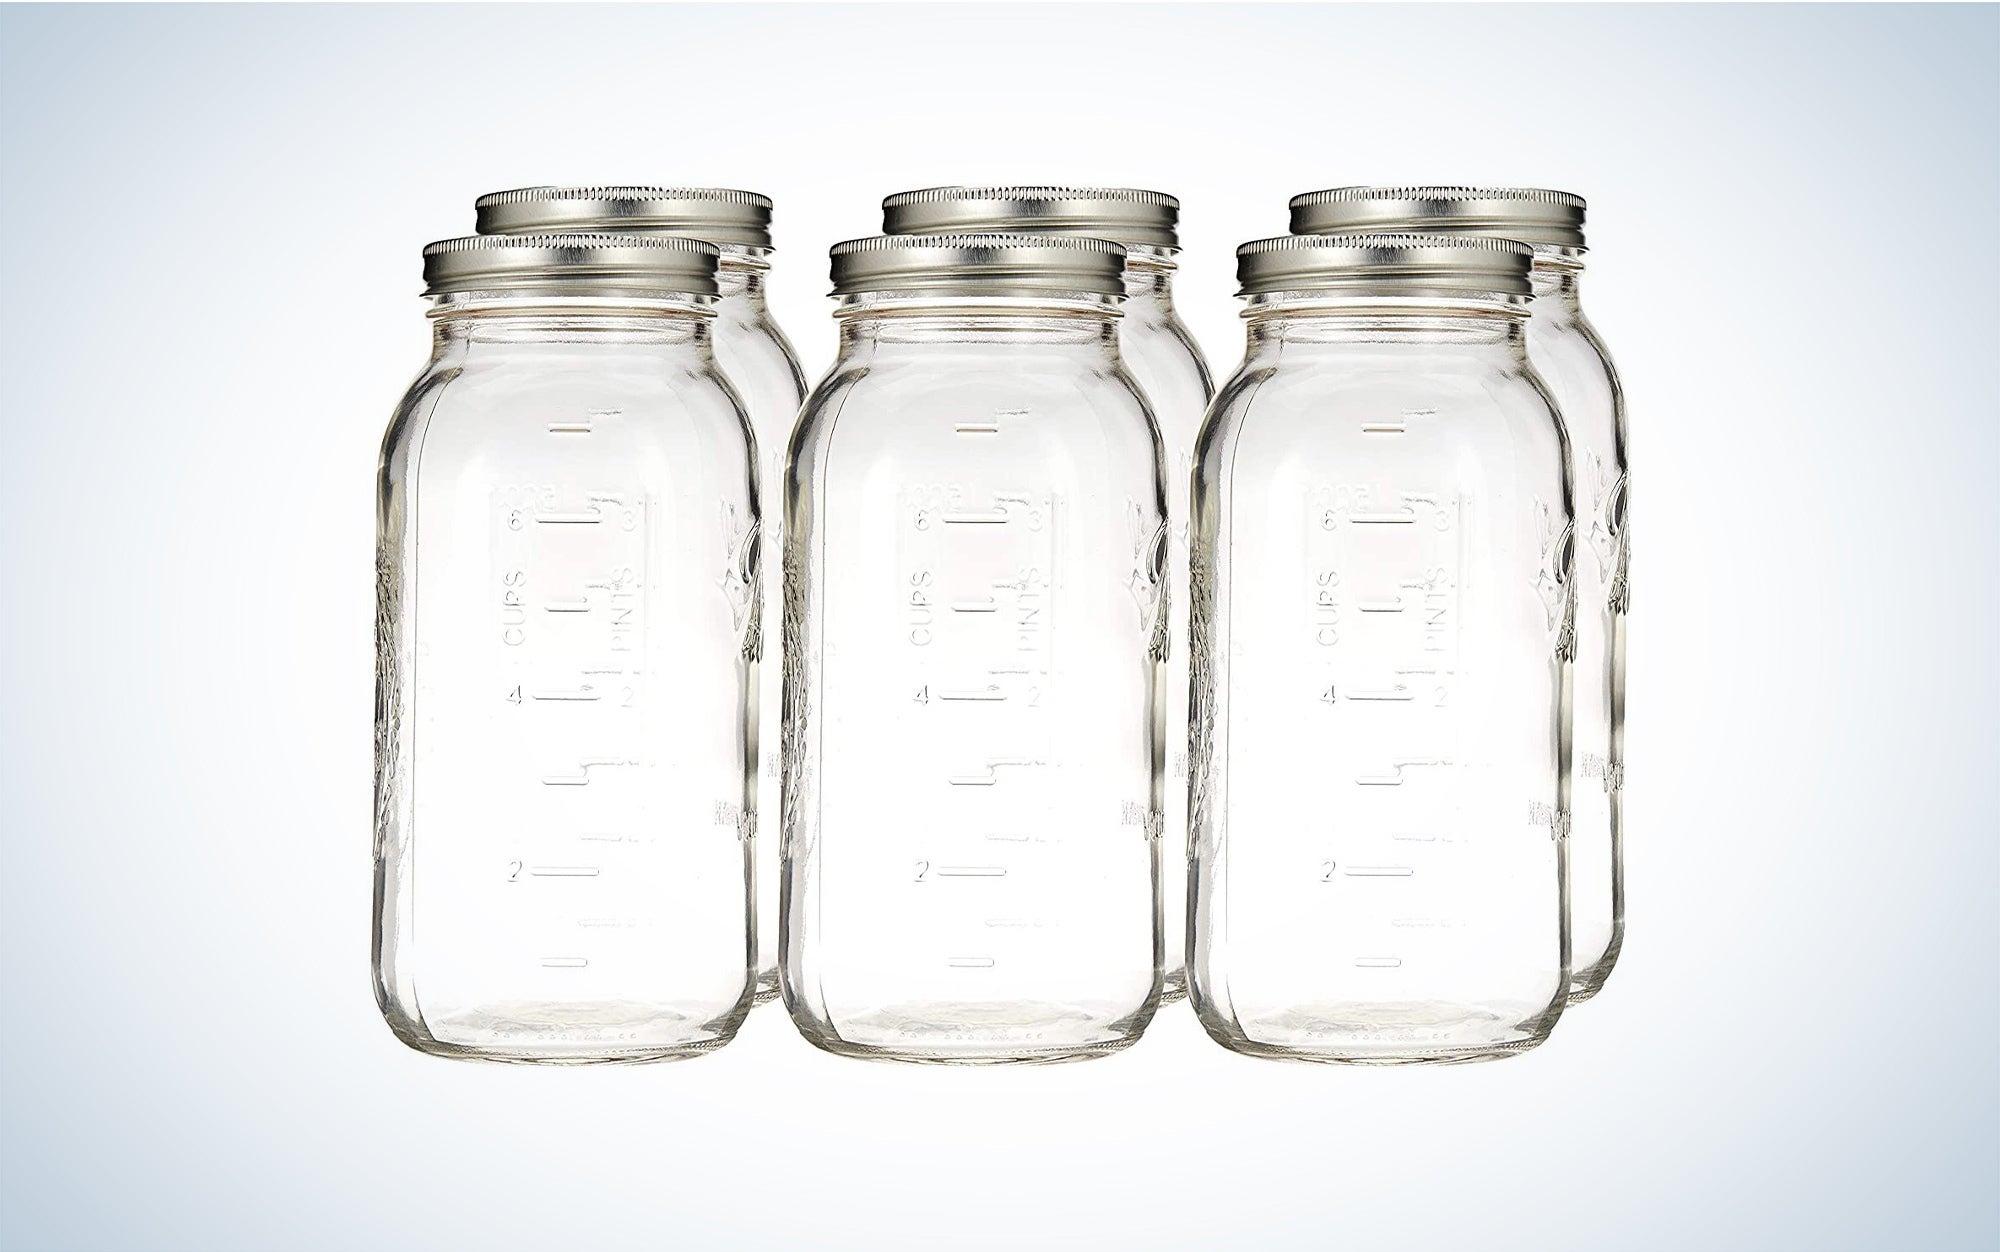 six glass 64-ounce Ball mason jars with metal lids